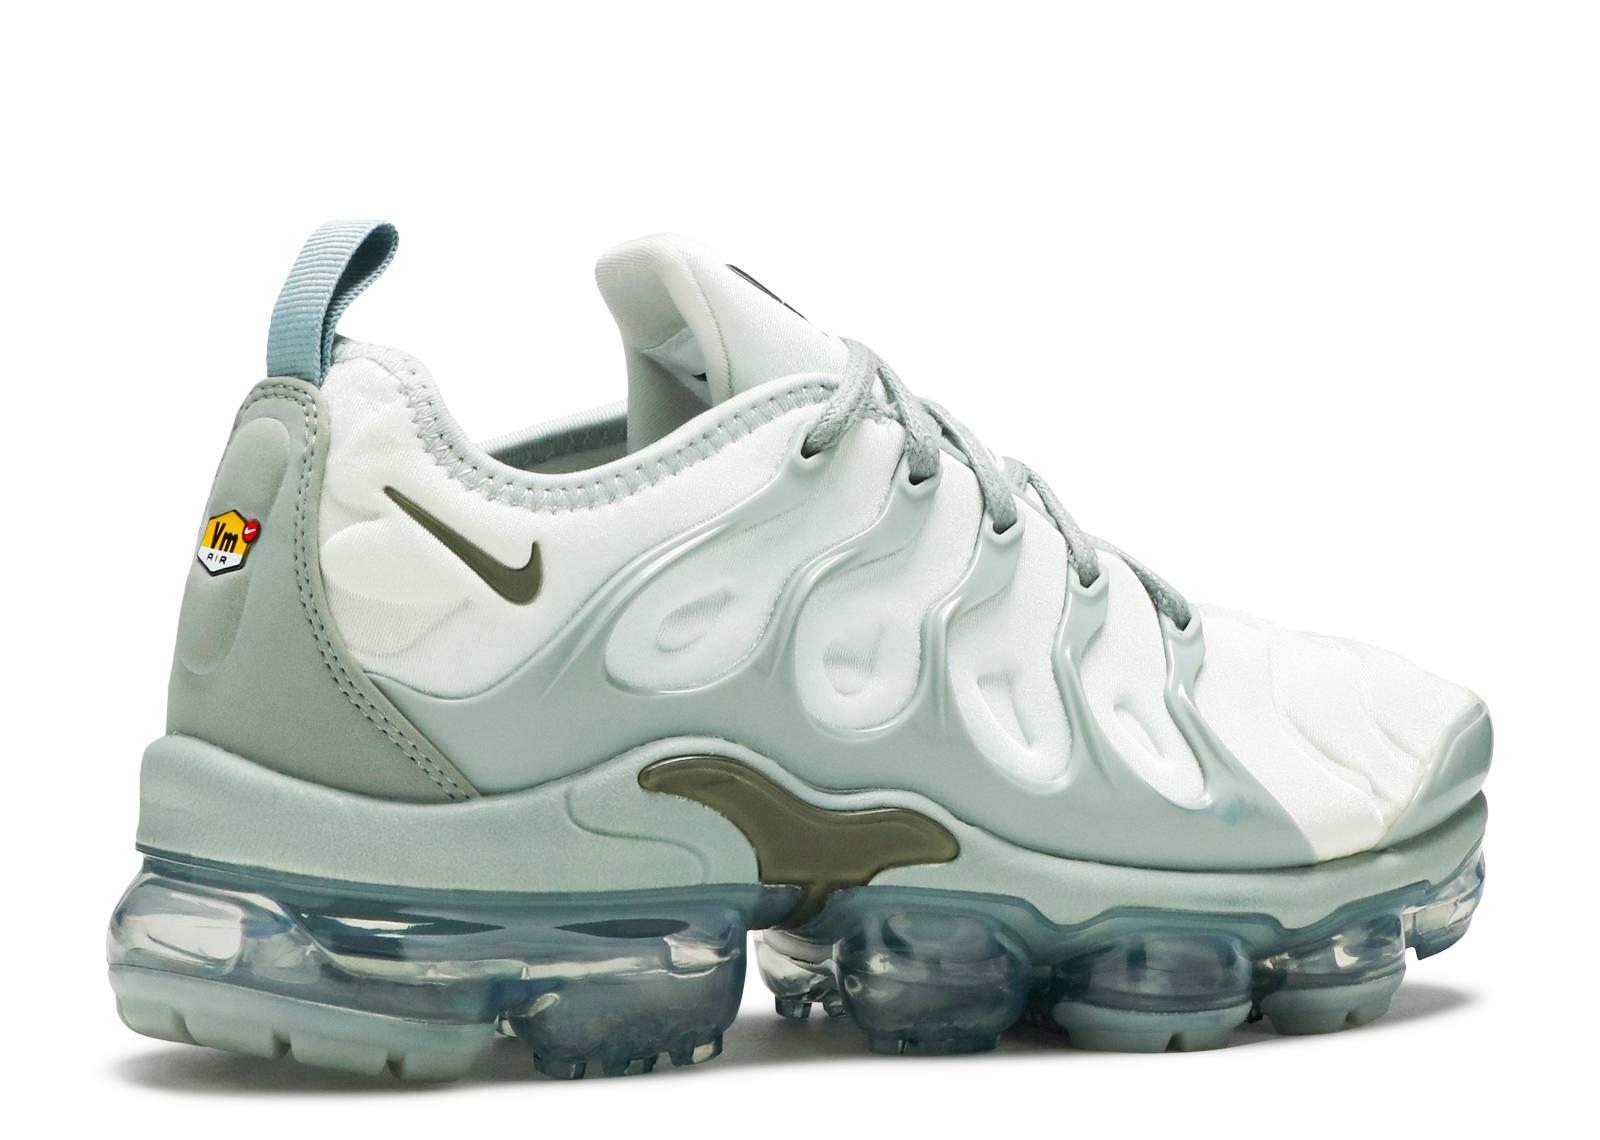 5f3a07f8cf7 Nike Vapormax Plus - Nike - ao4550 006 - light silver mica green reflect  silver medium olive